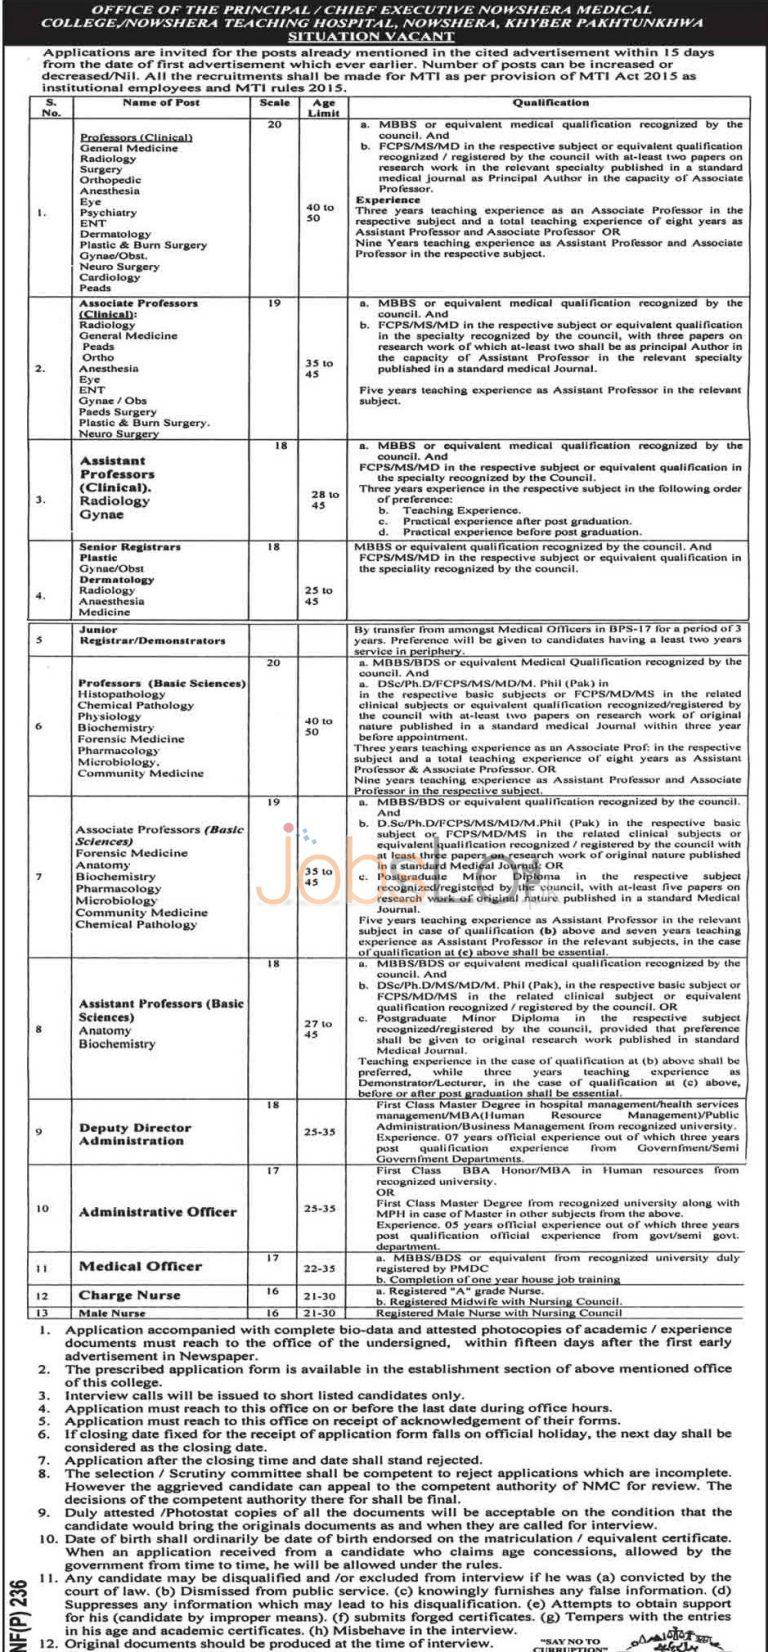 Nowshera Medical and Teaching Hospital Jobs 2016 in Khyber Pakhtunkhwa